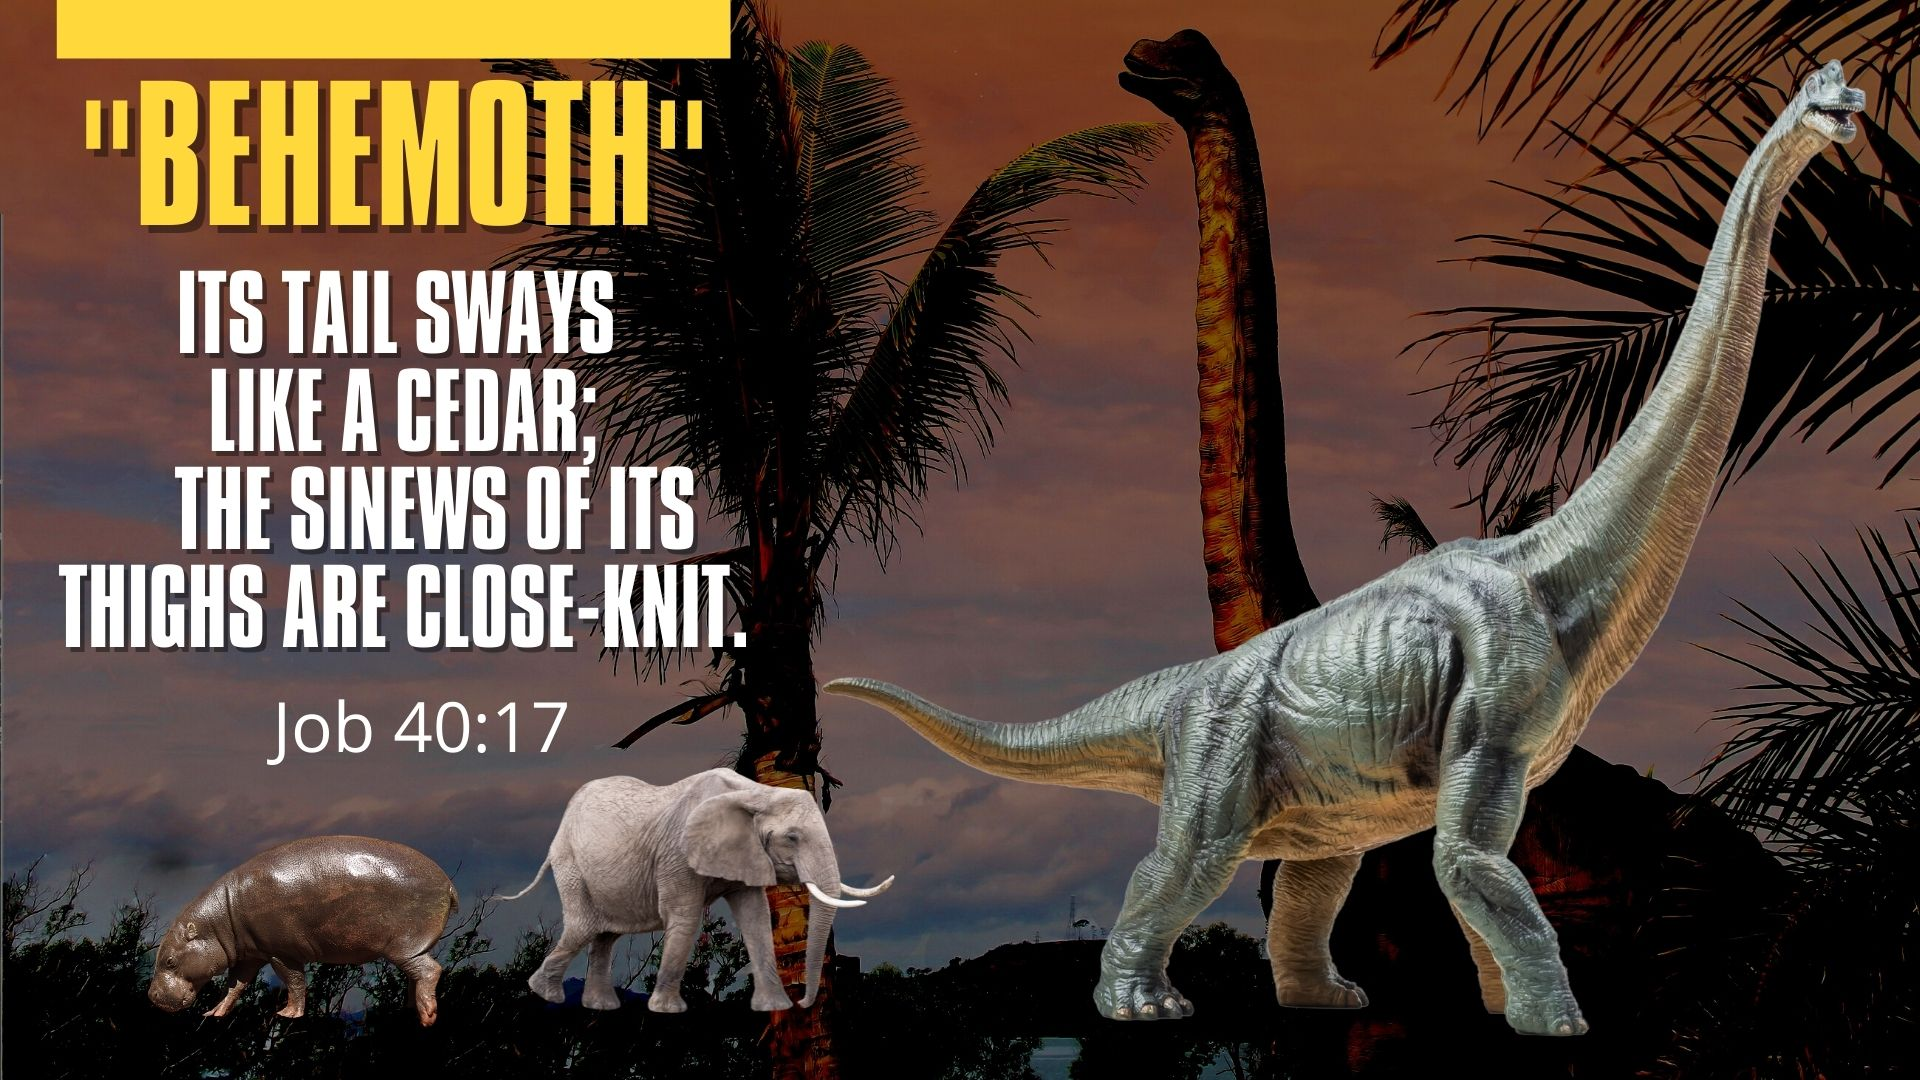 Behemoth.Job 40.17